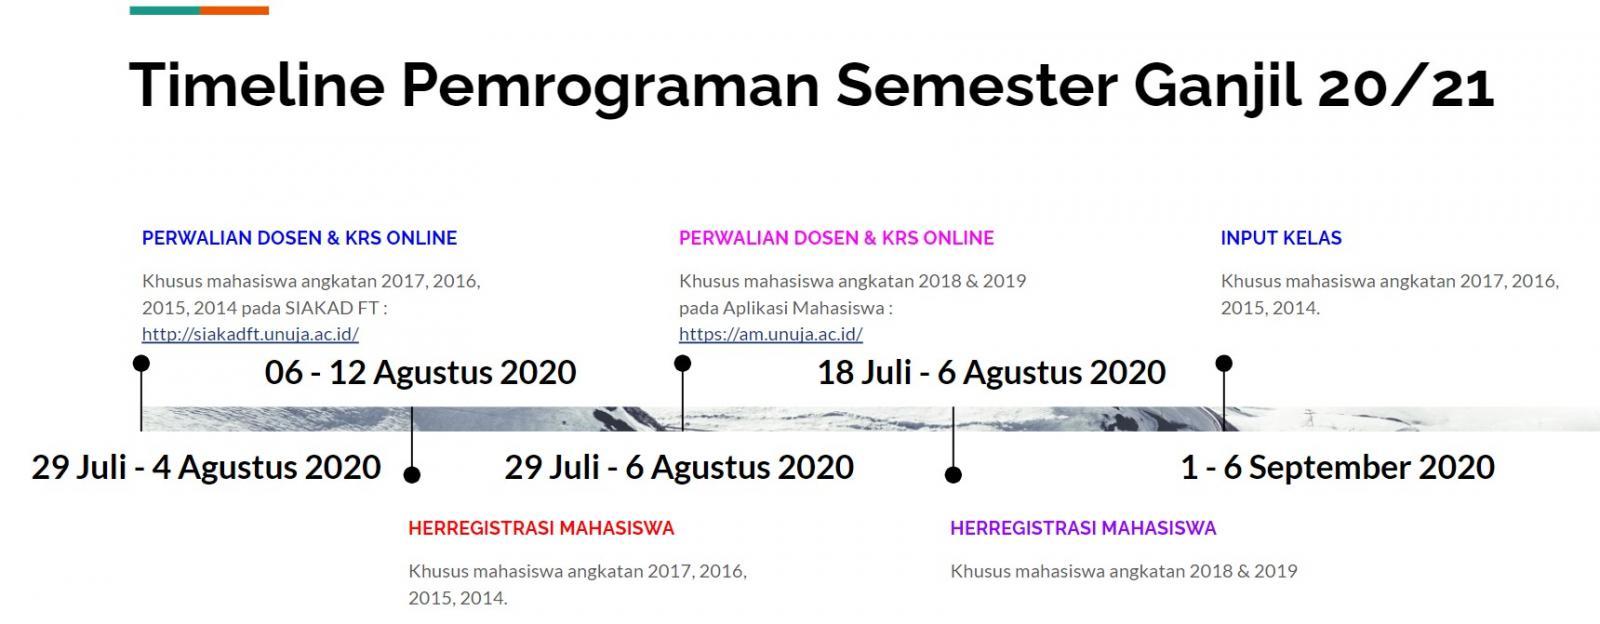 pengumuman-pemrograman-semester-ganjil-ta-2020-2021